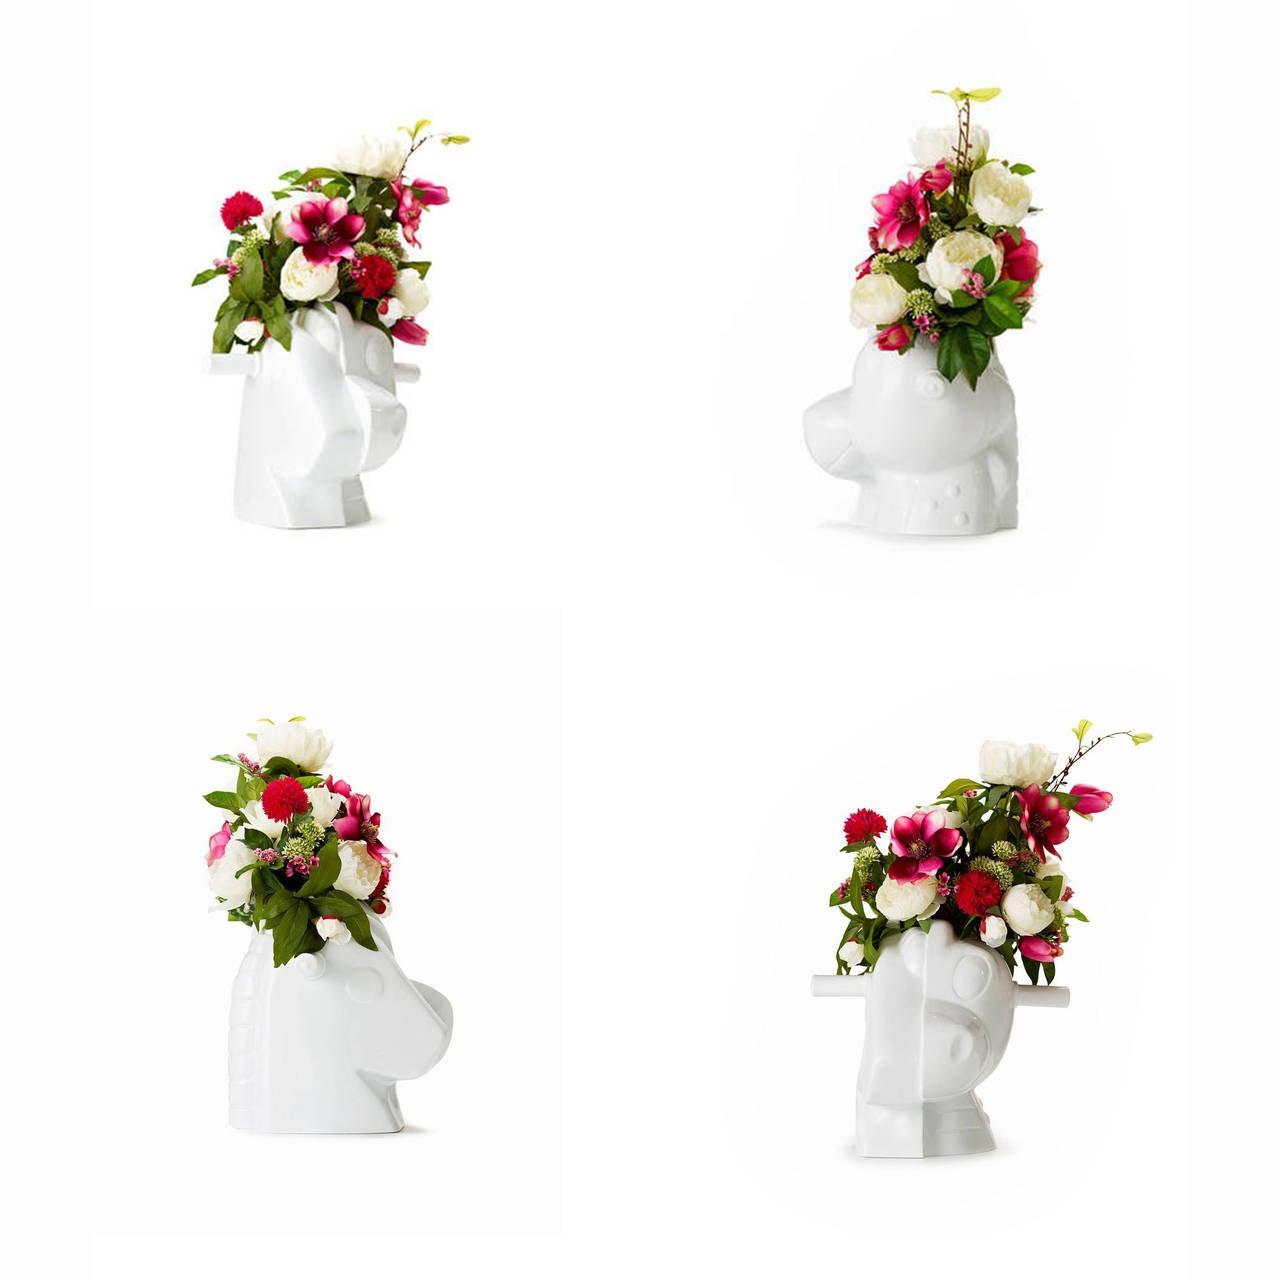 French Split Rocker Vase by Jeff Koons For Sale